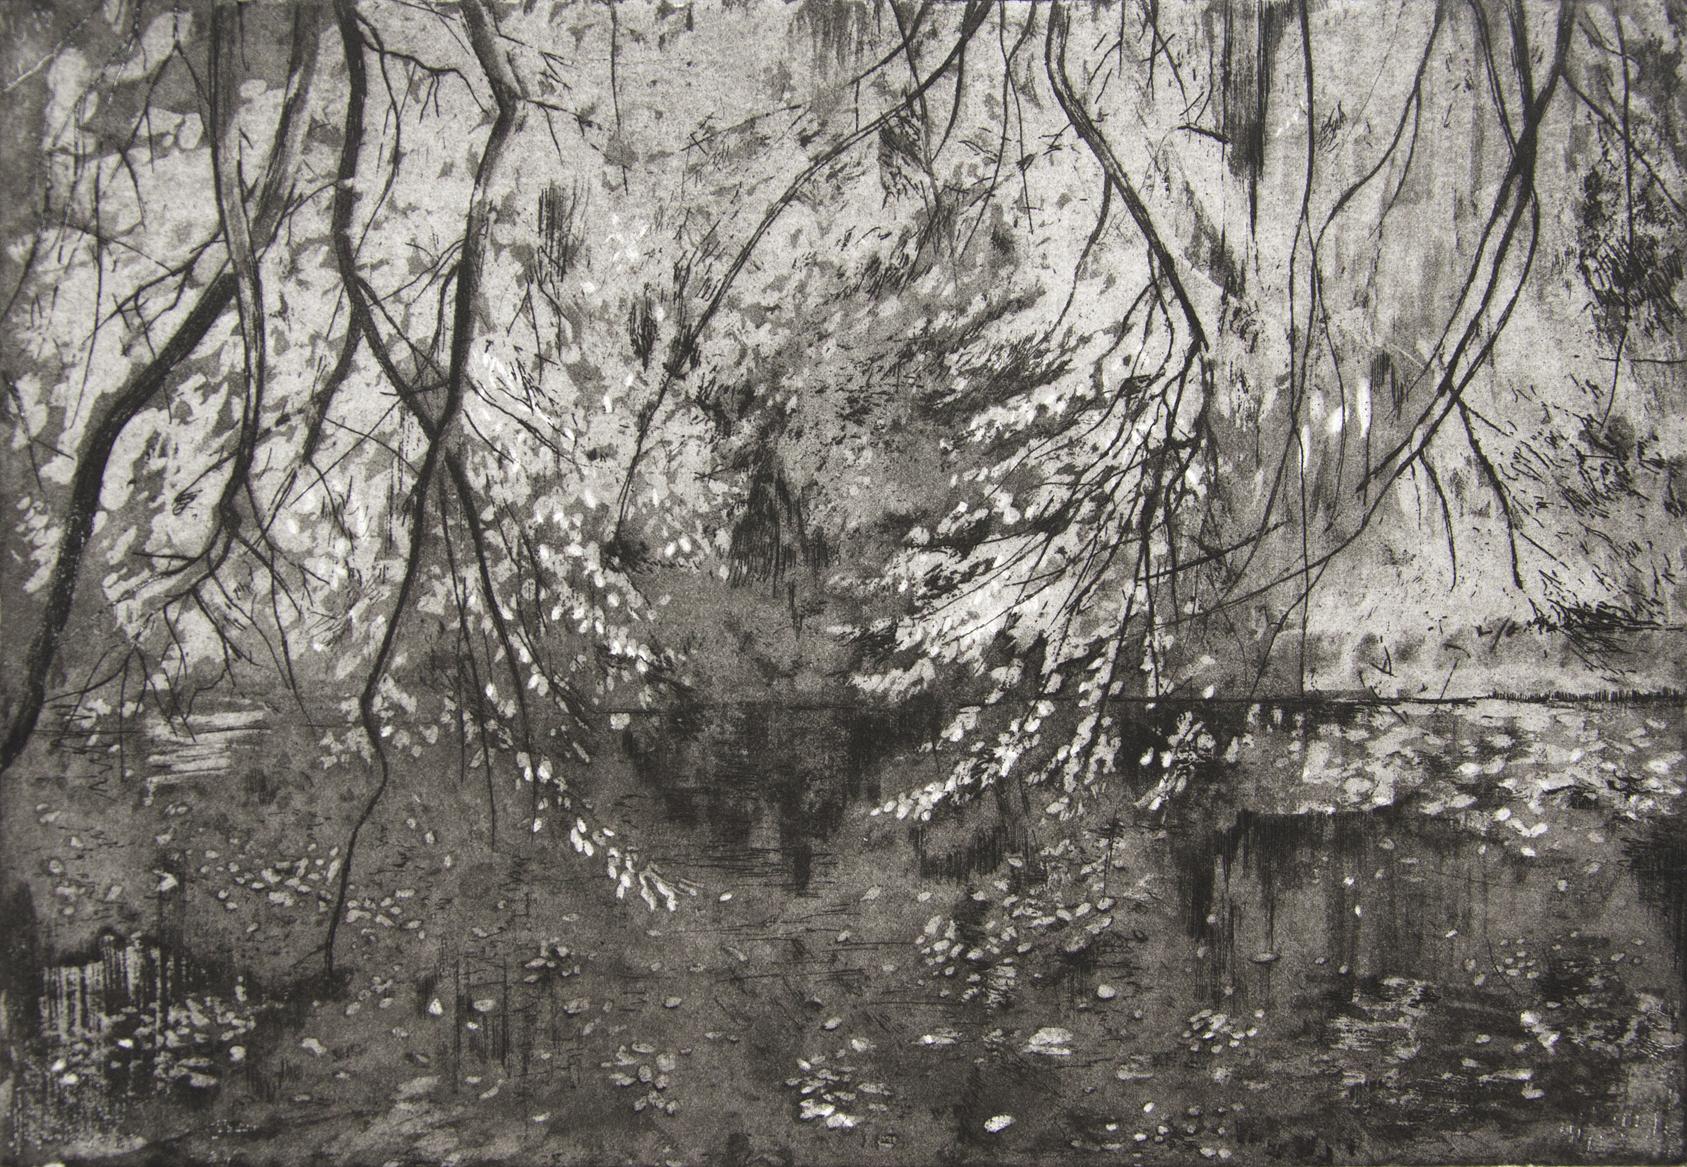 Katsura, Benmore, etching, 2015, 17 x 25 cm, £350